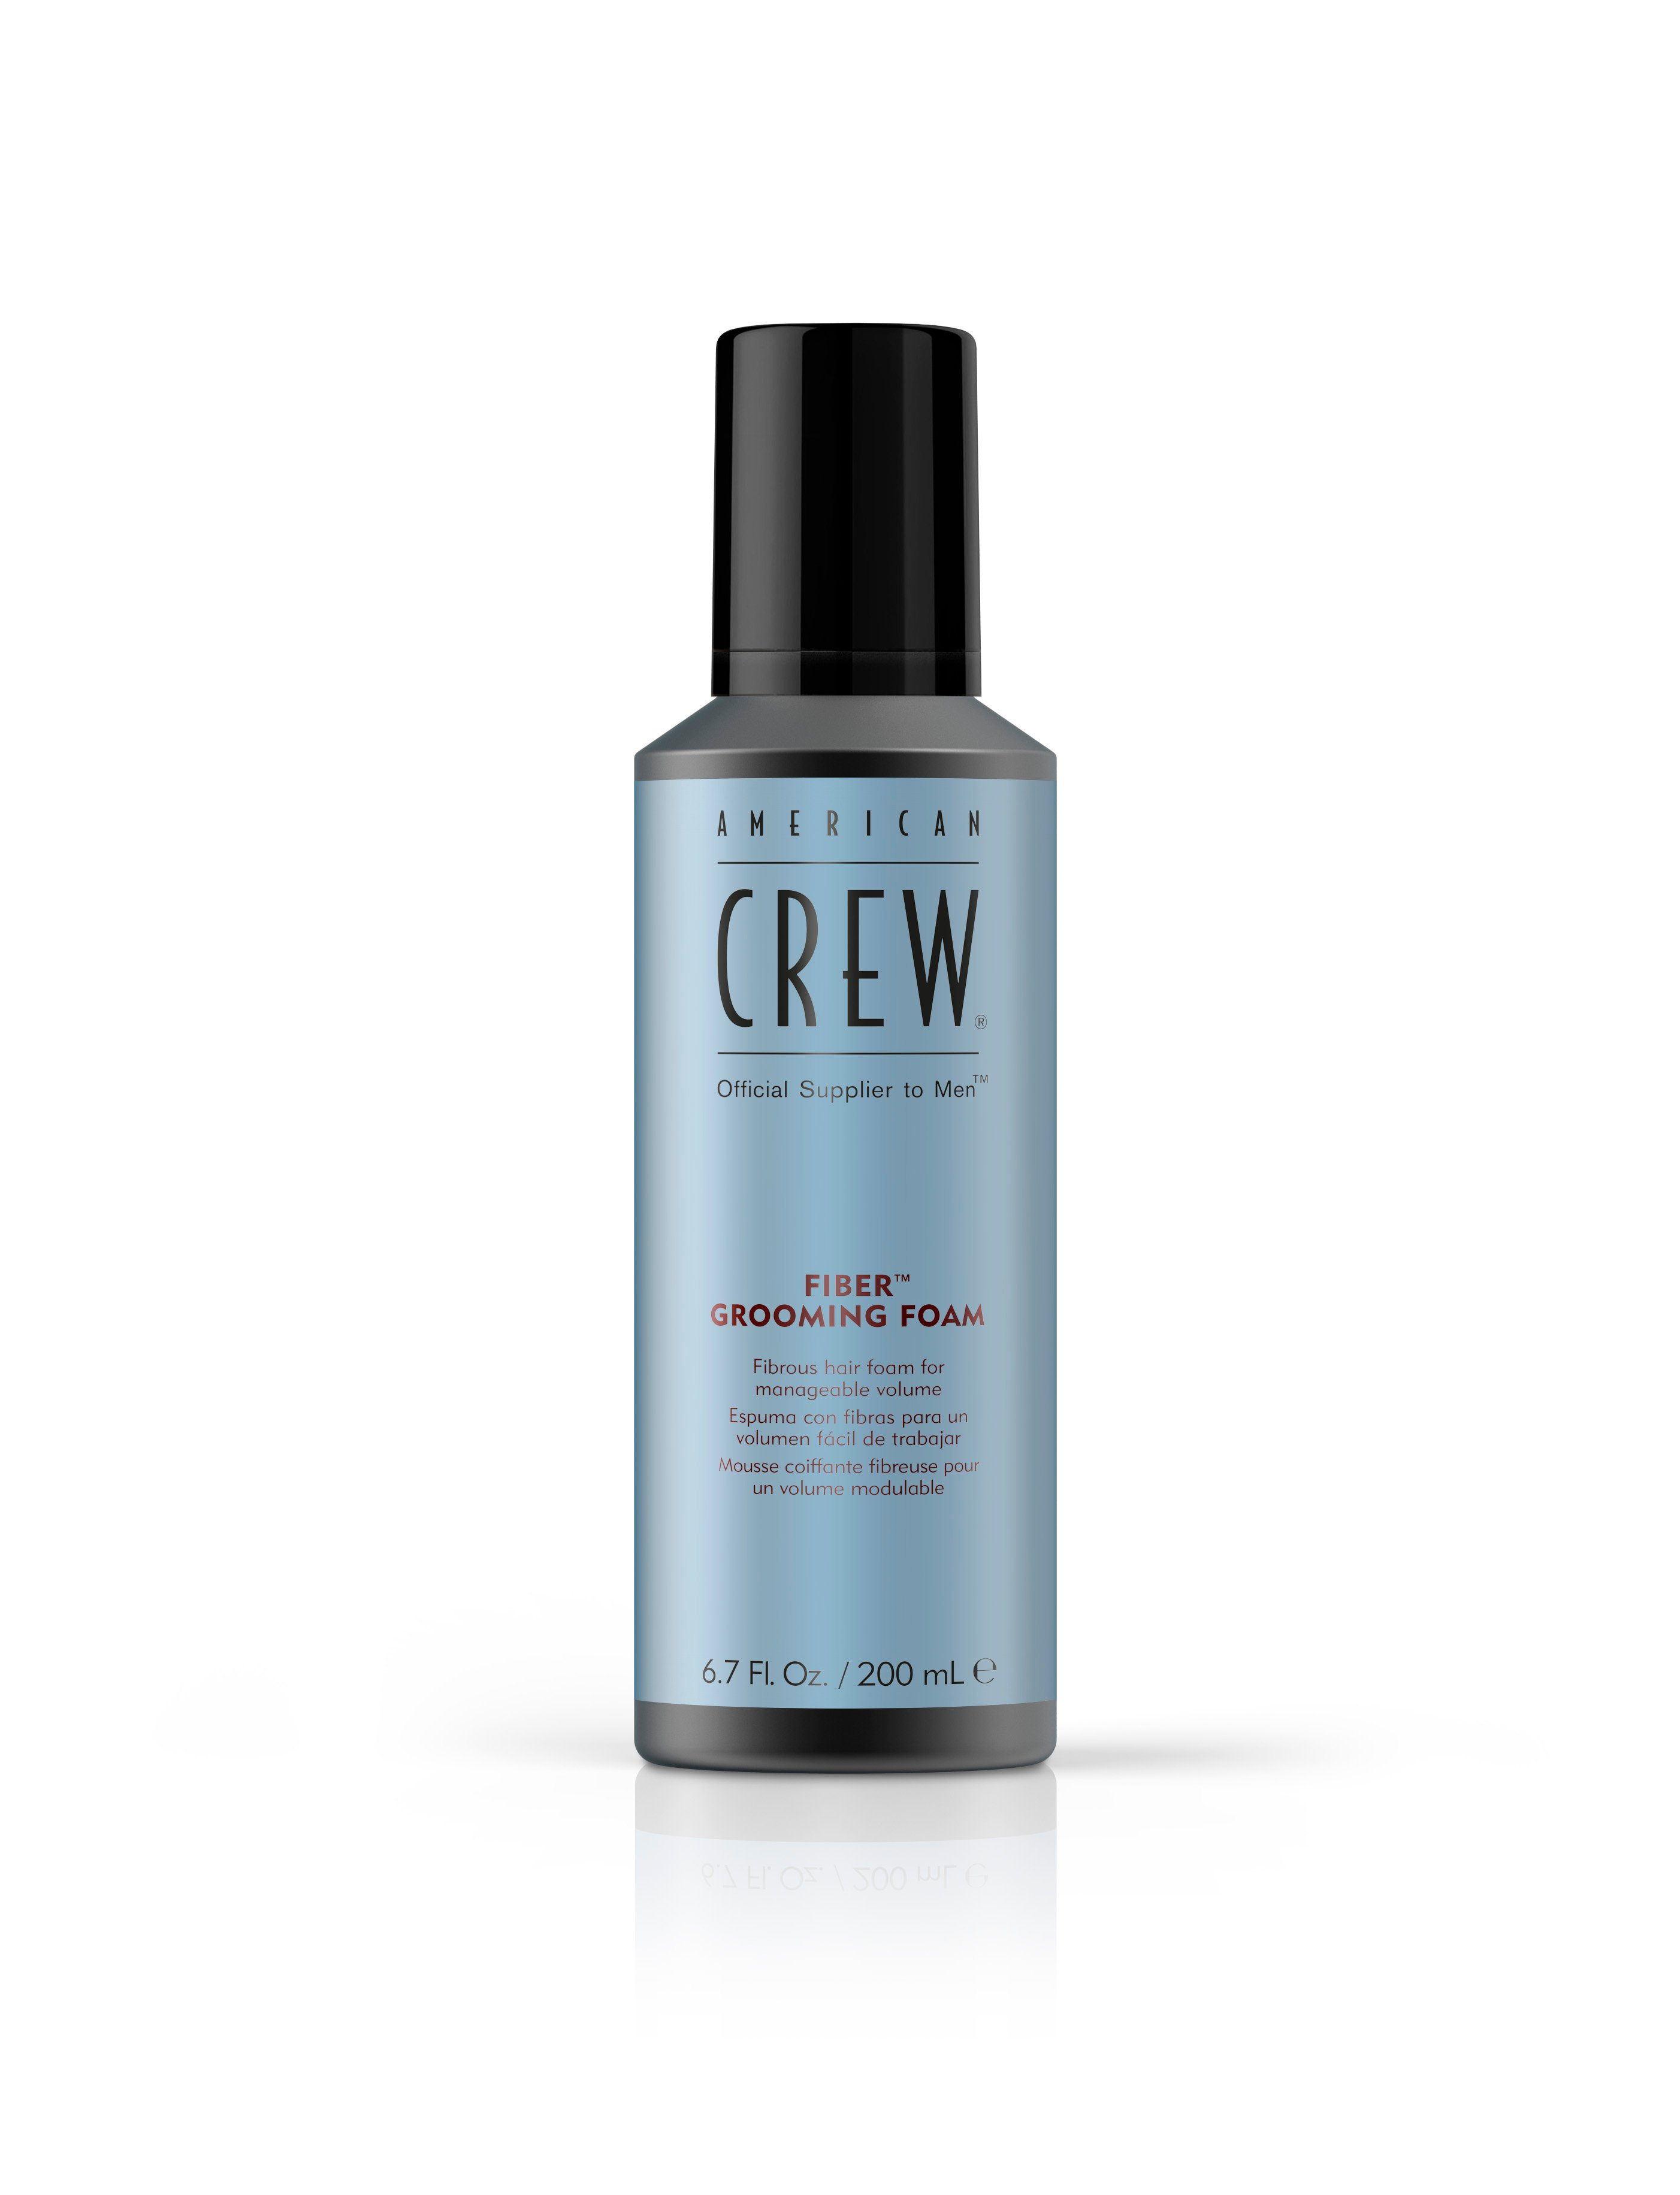 American Crew - Fiber Grooming Foam 200 ml